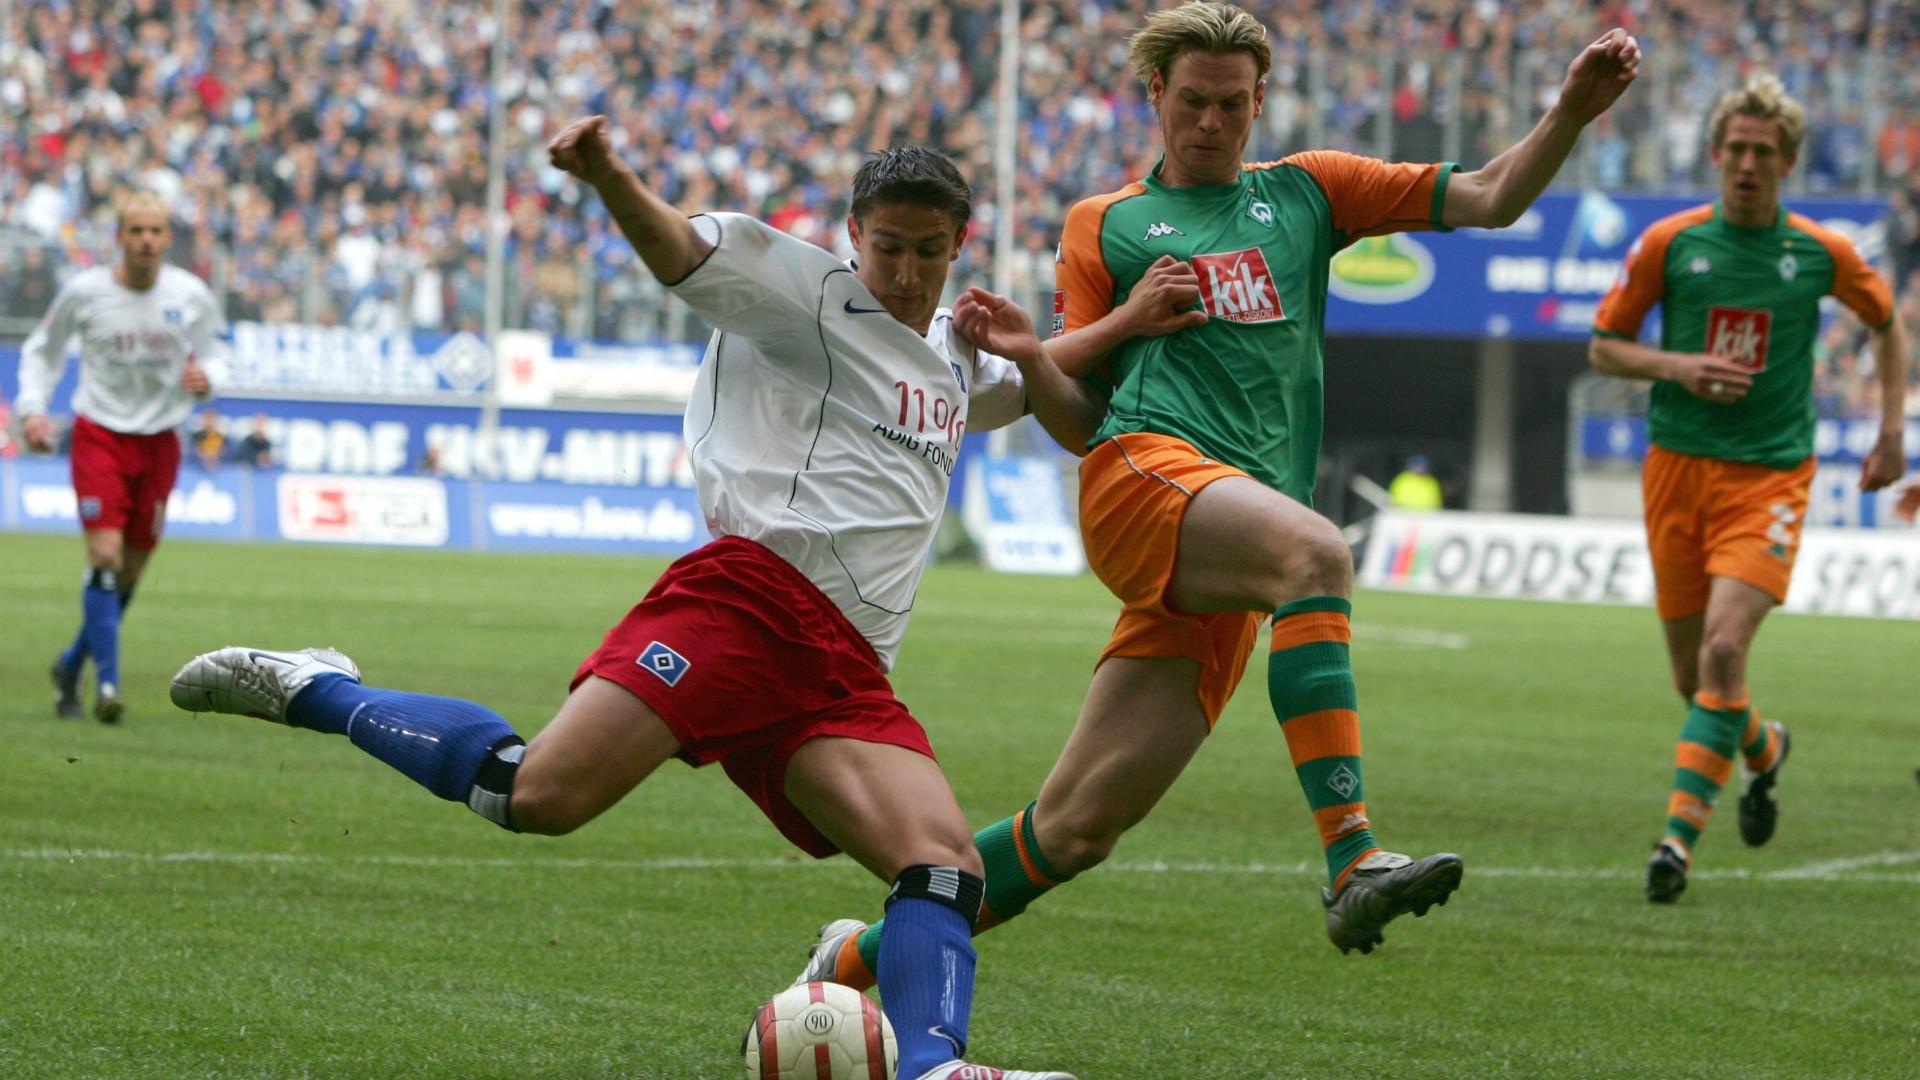 Mustafa Kucukovic Hamburger SV 08042005